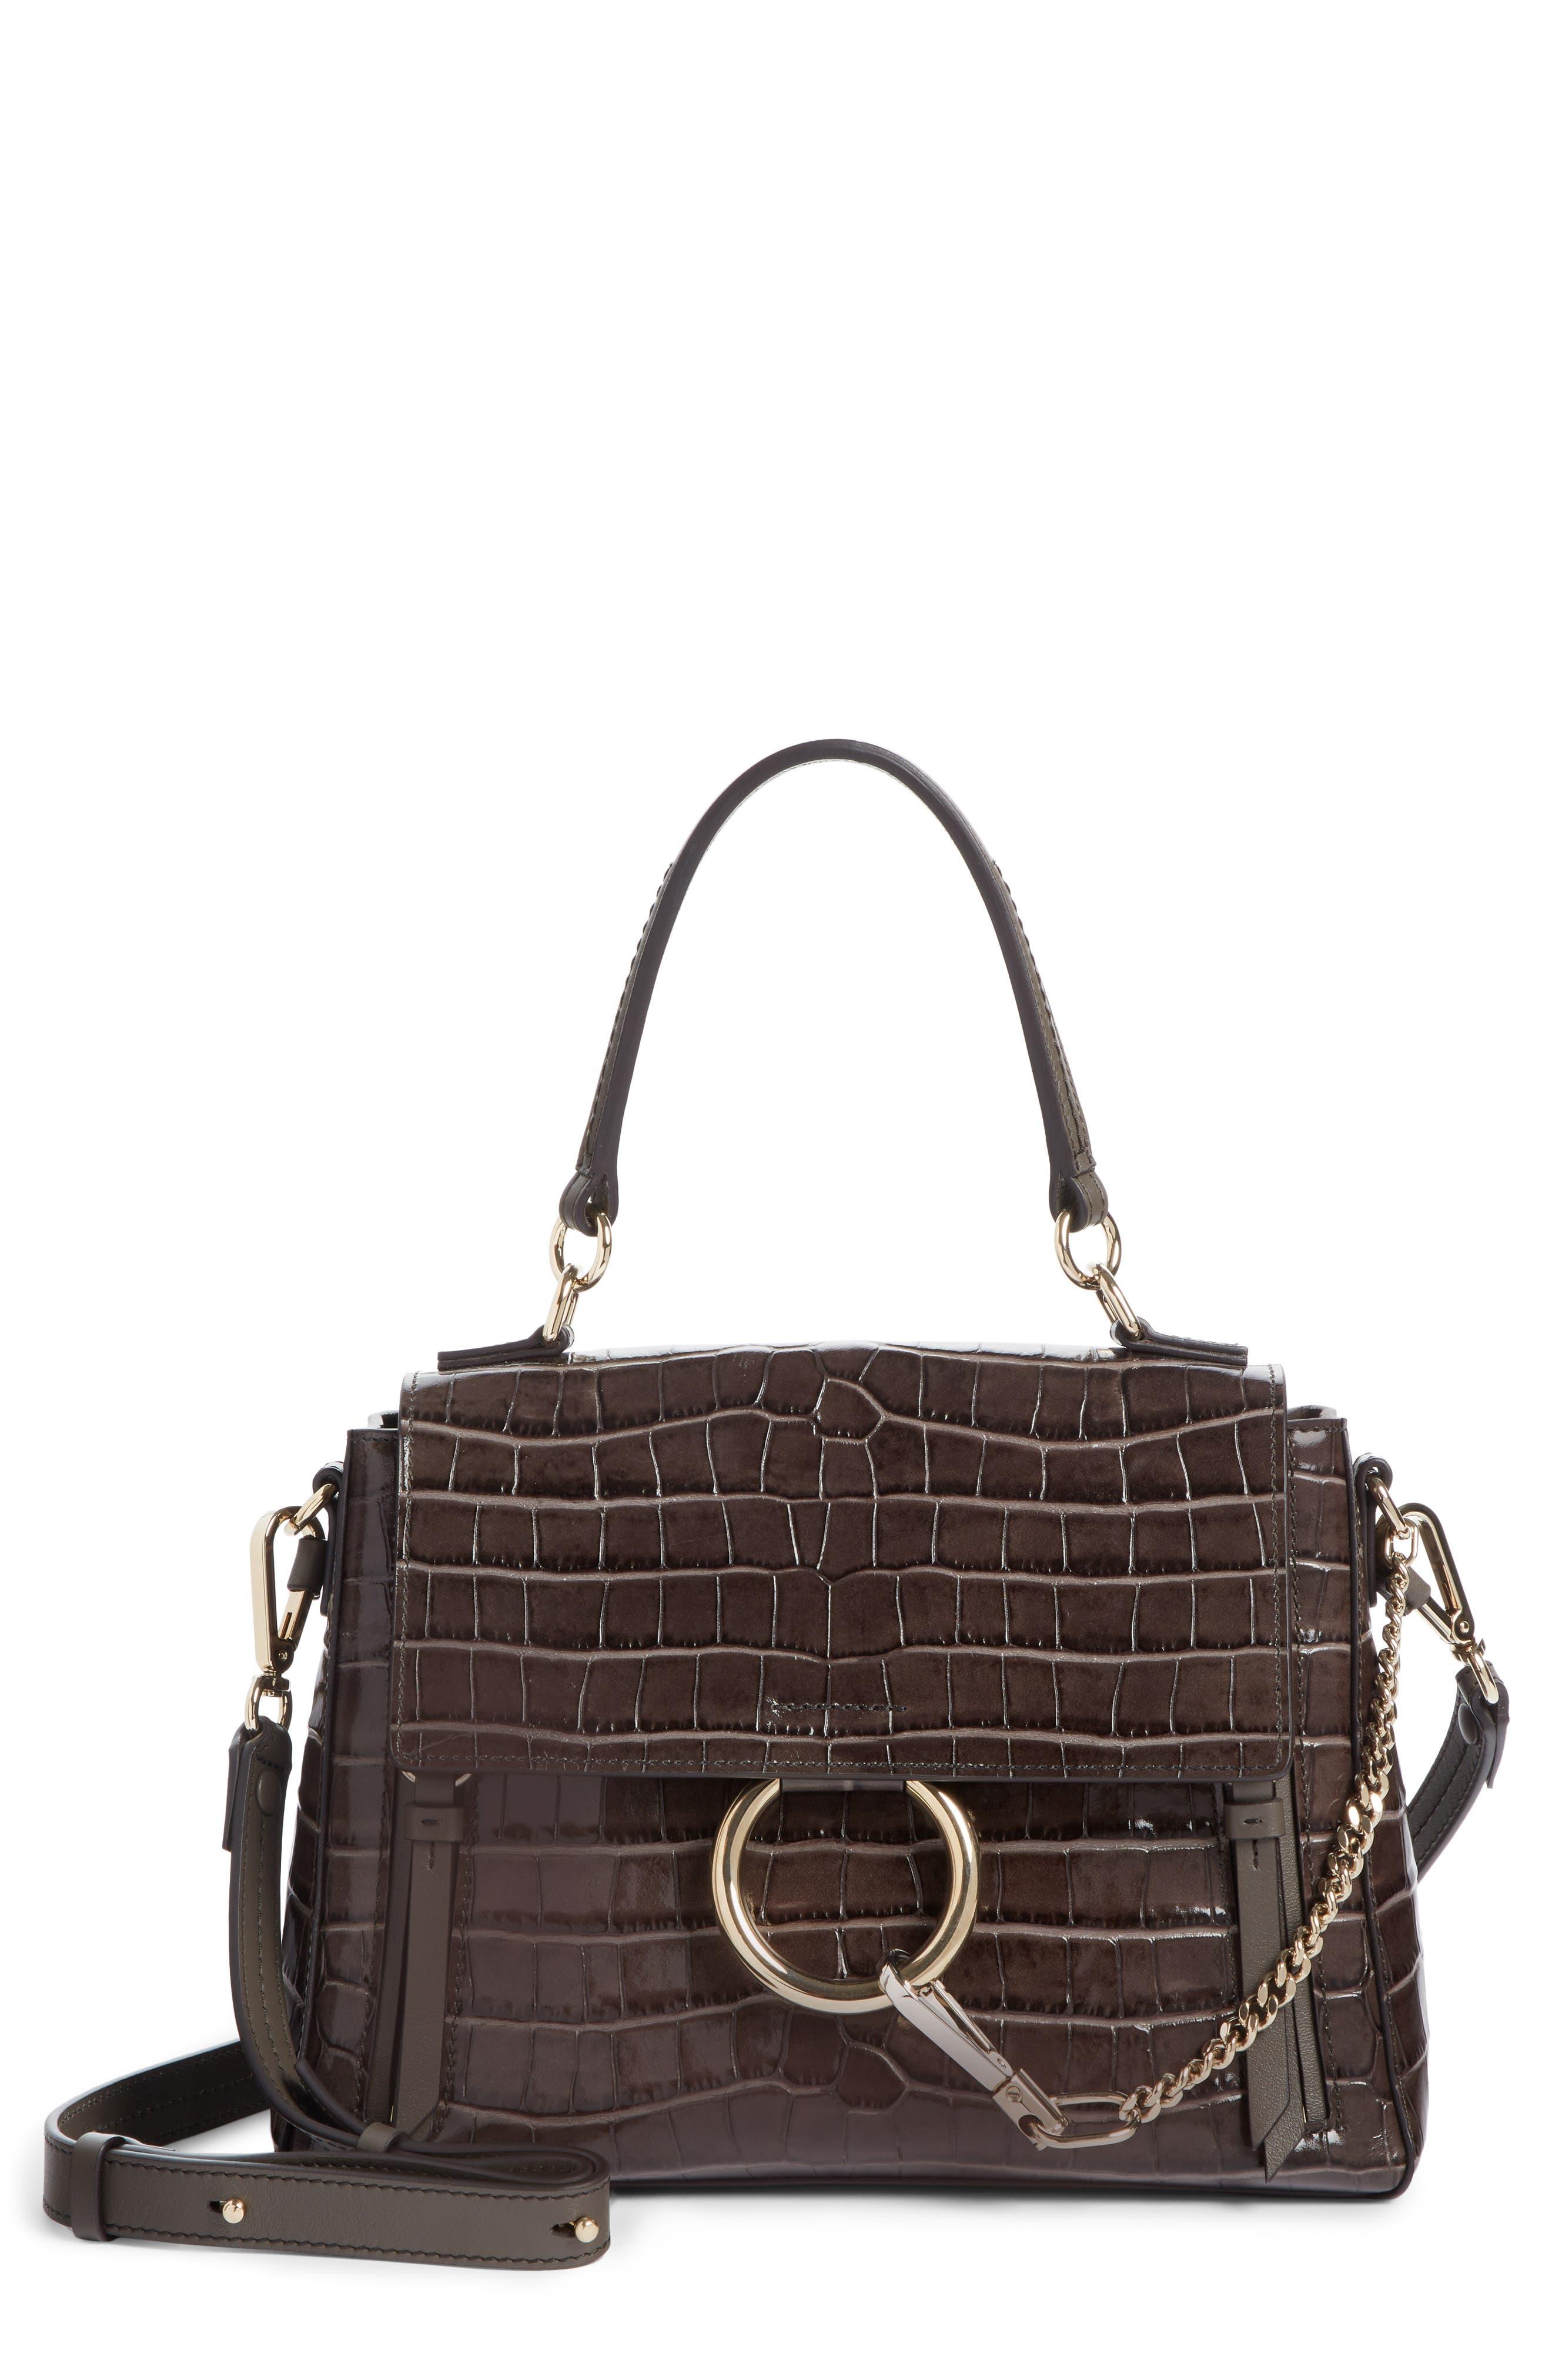 Medium Faye Day Croc Embossed Leather Shoulder Bag,                             Main thumbnail 1, color,                             AUTUMNAL BROWN